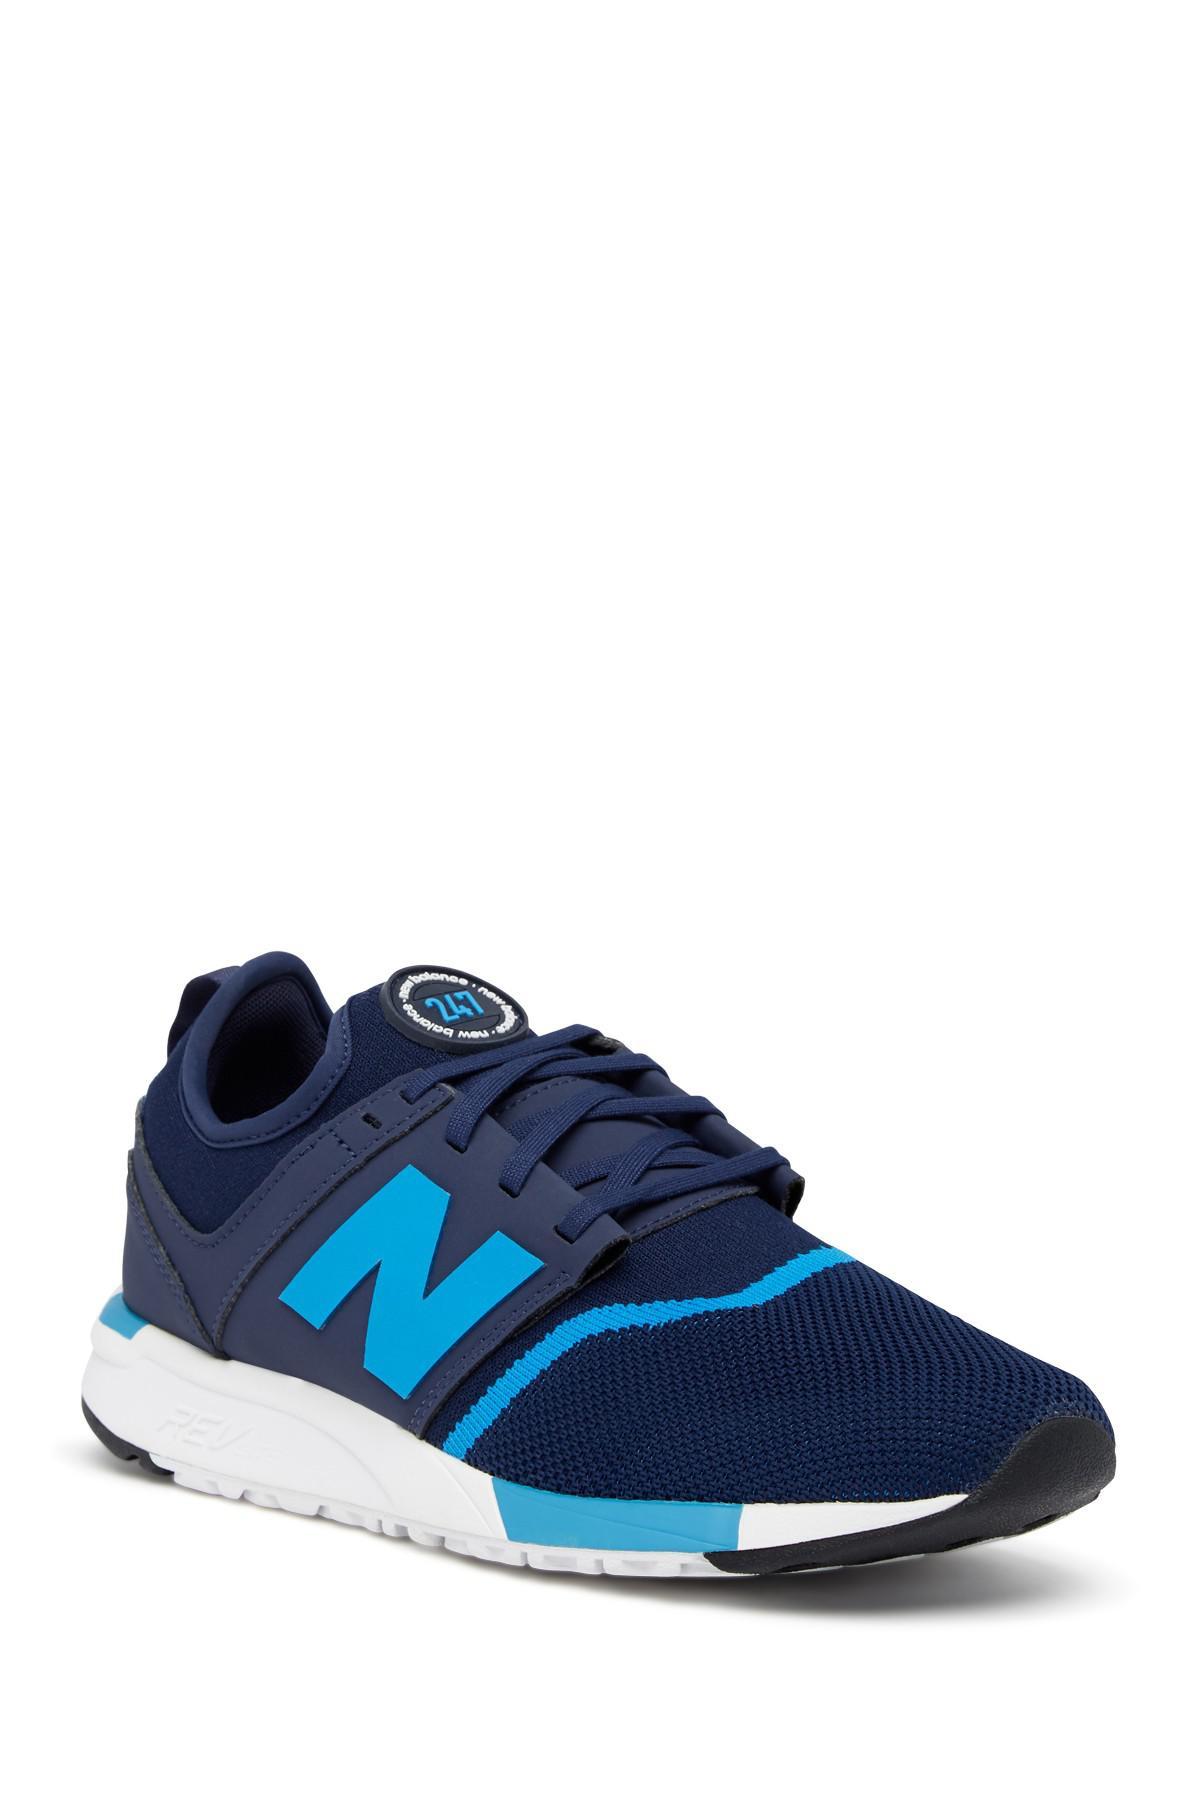 New Balance Synthetic Mrl247 Revlite Sneaker in Navy (Blue) for ...